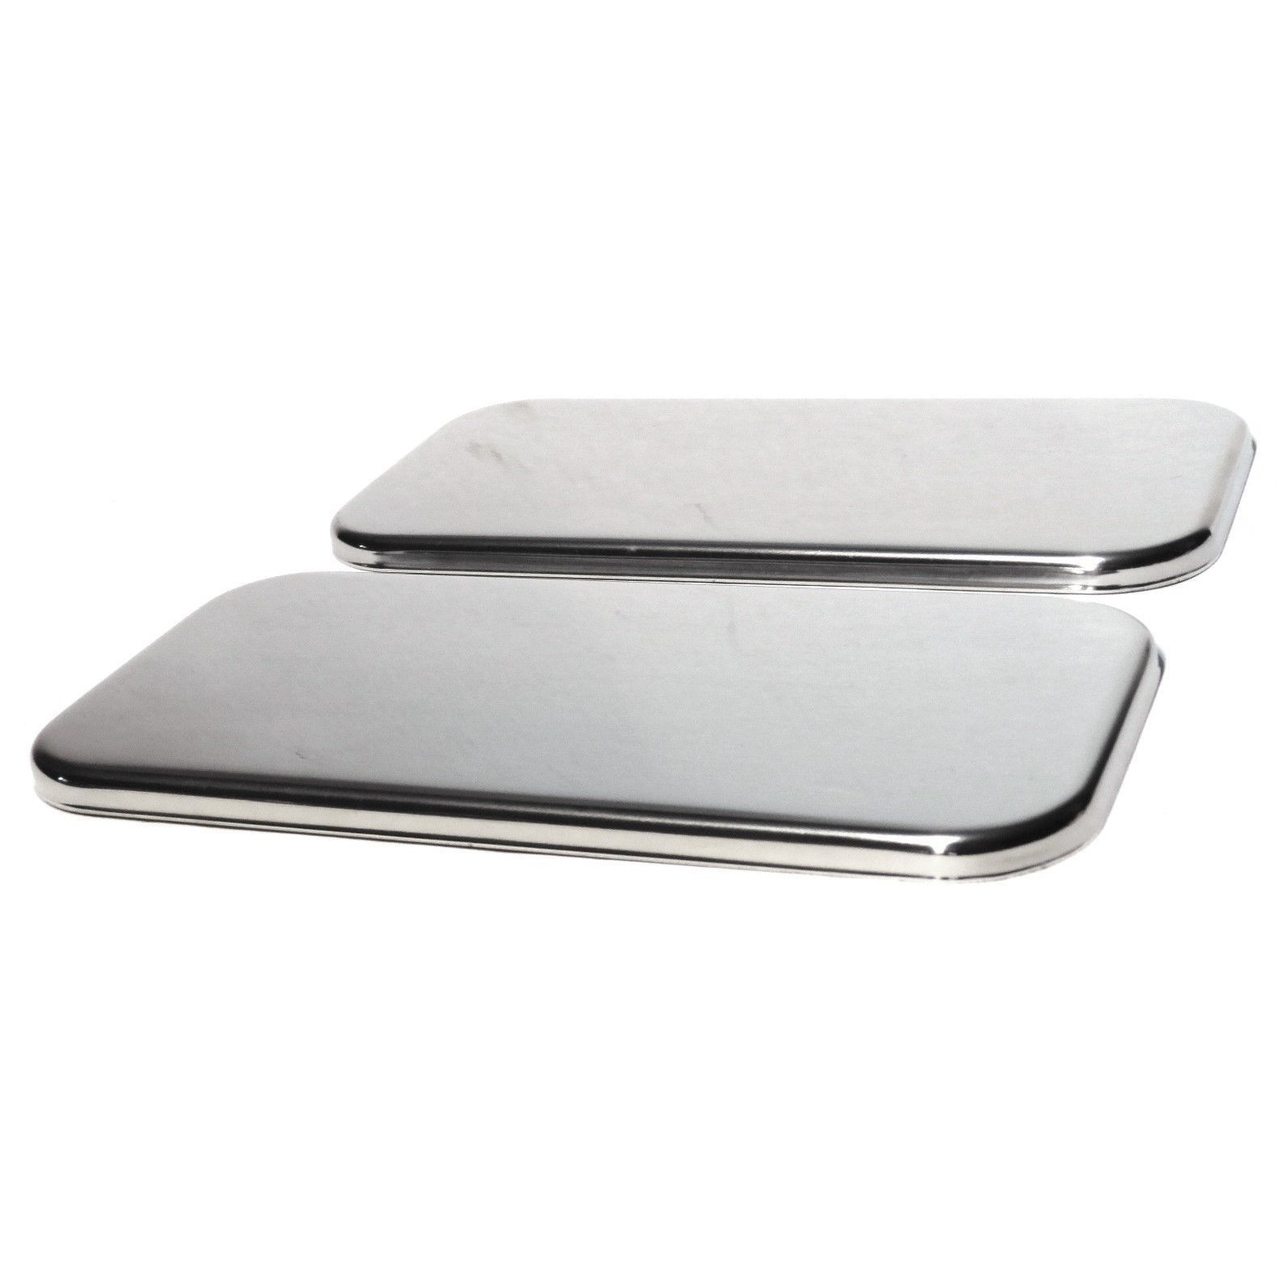 Sleeper vent door plain stainless steel covers for Freightliner Century Classic, Pair